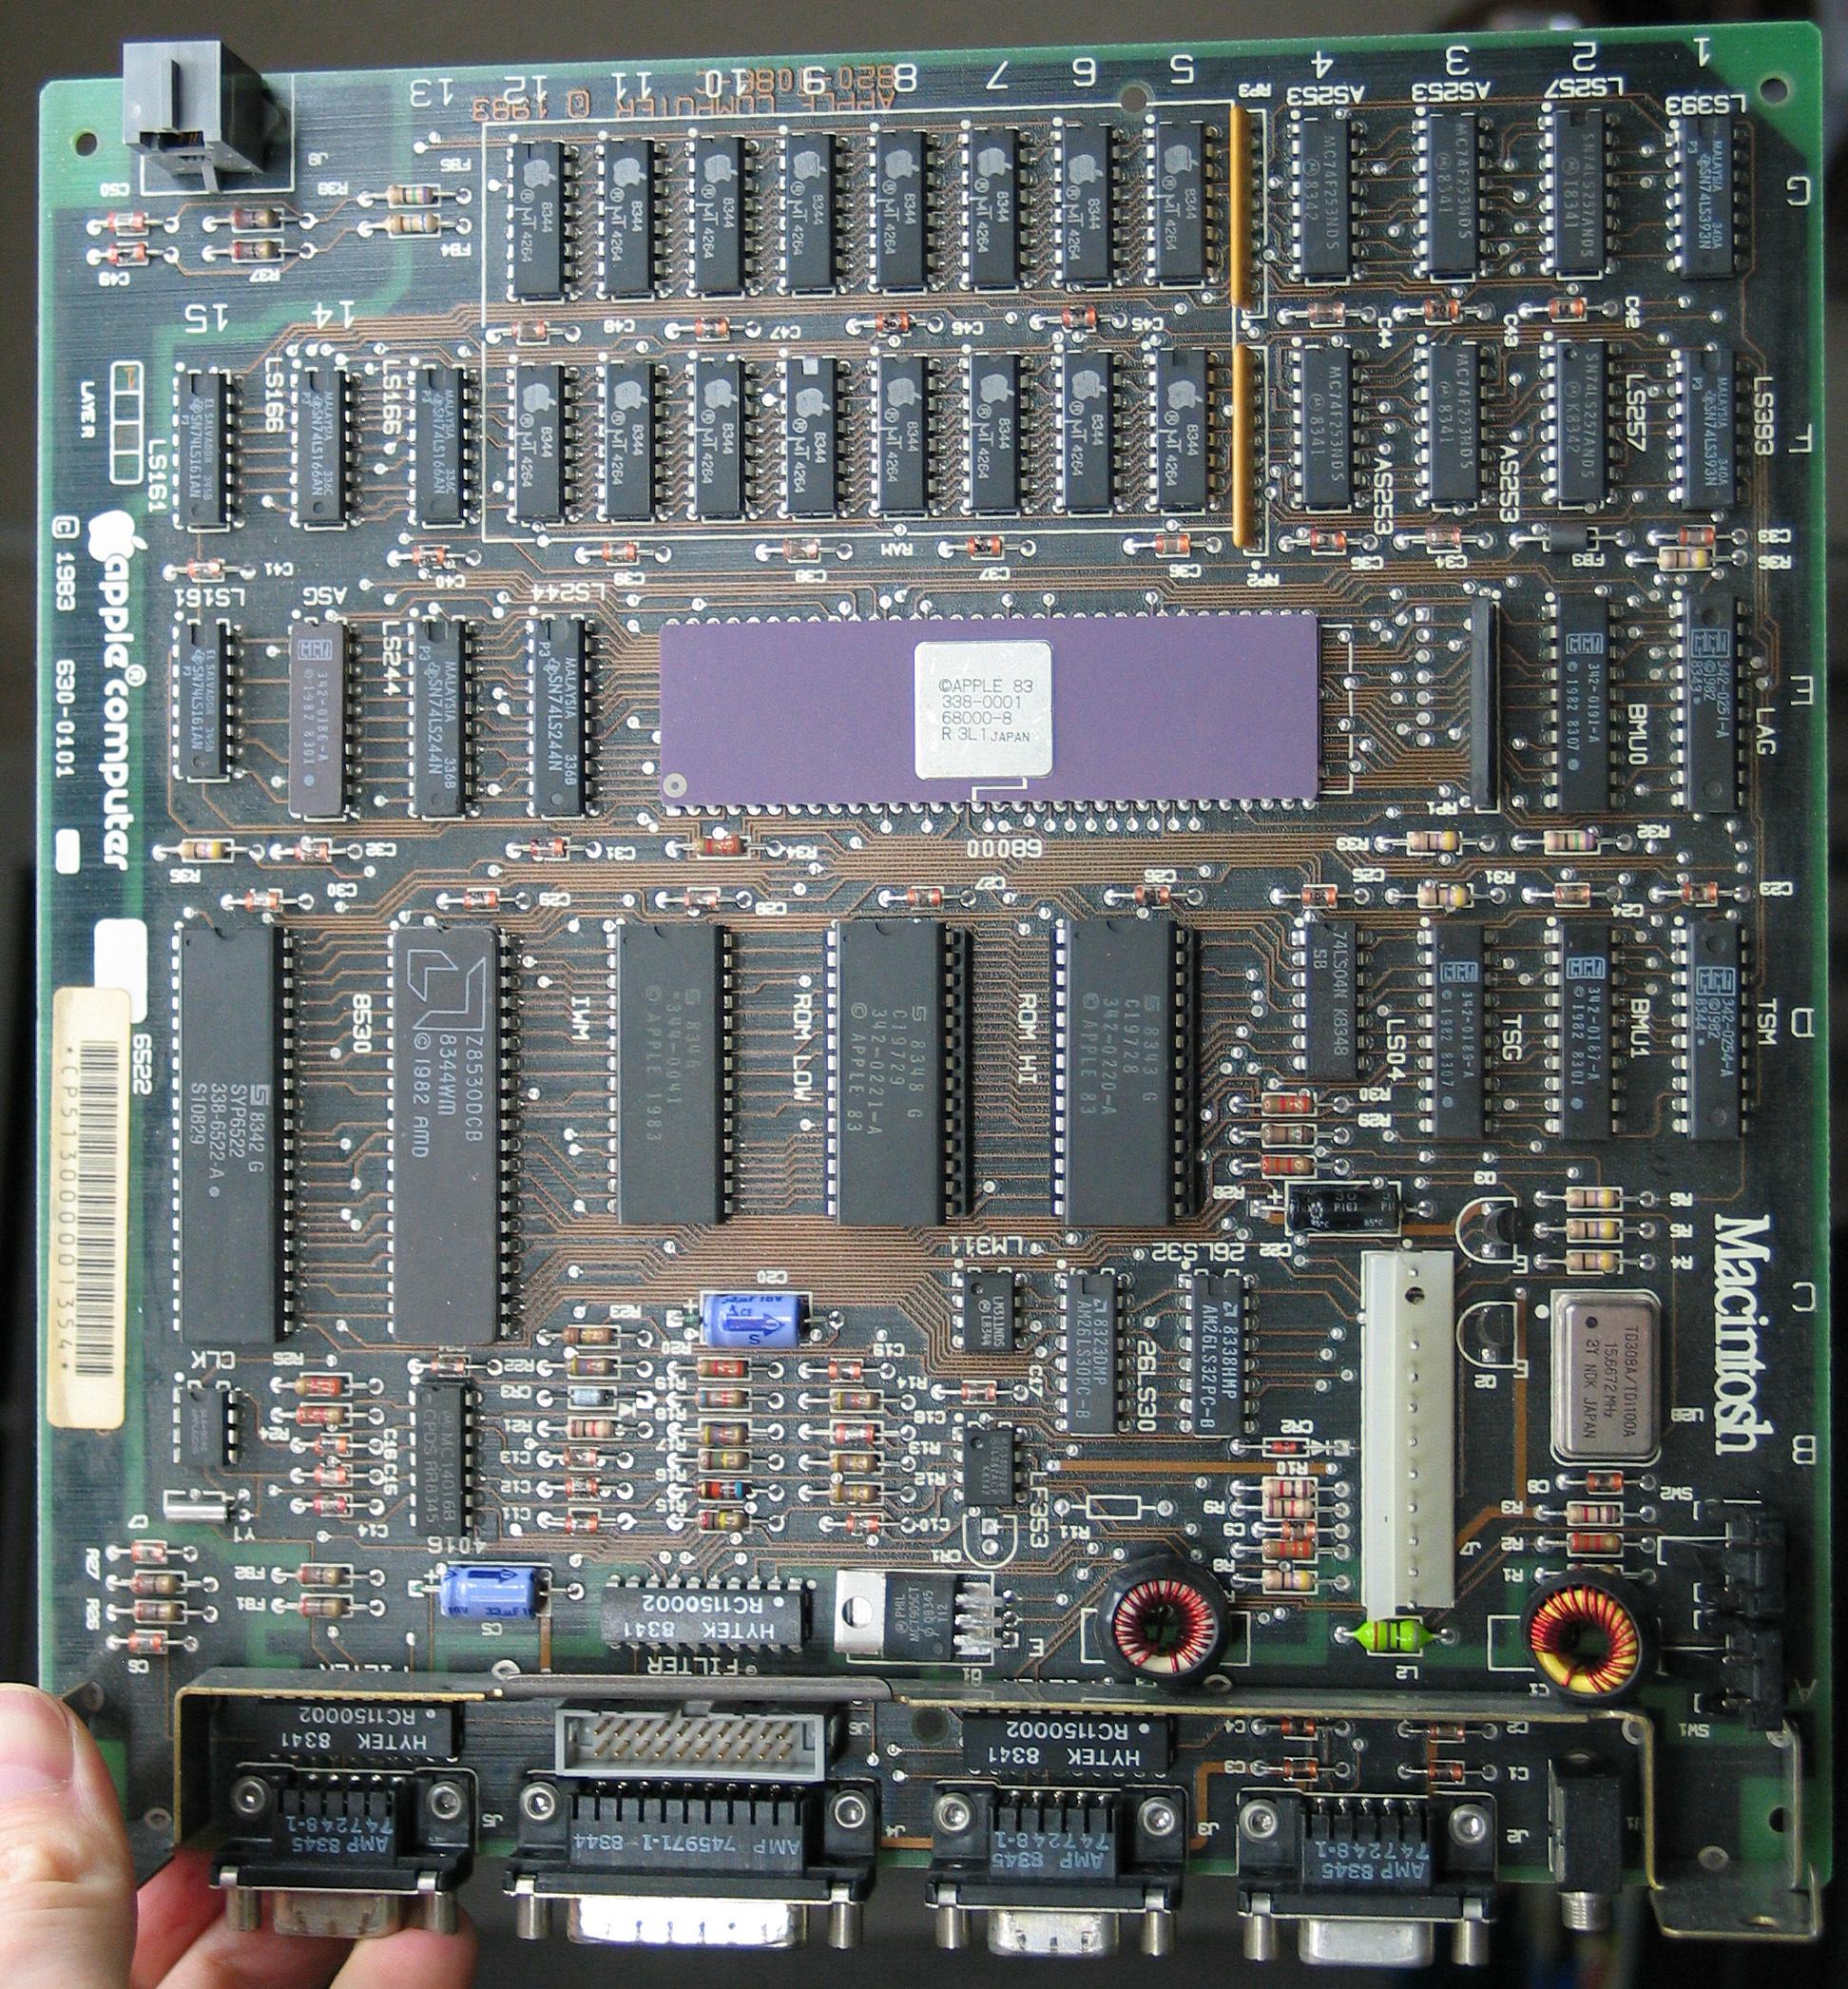 Early Mac 128k Logic Board Photo (Top)